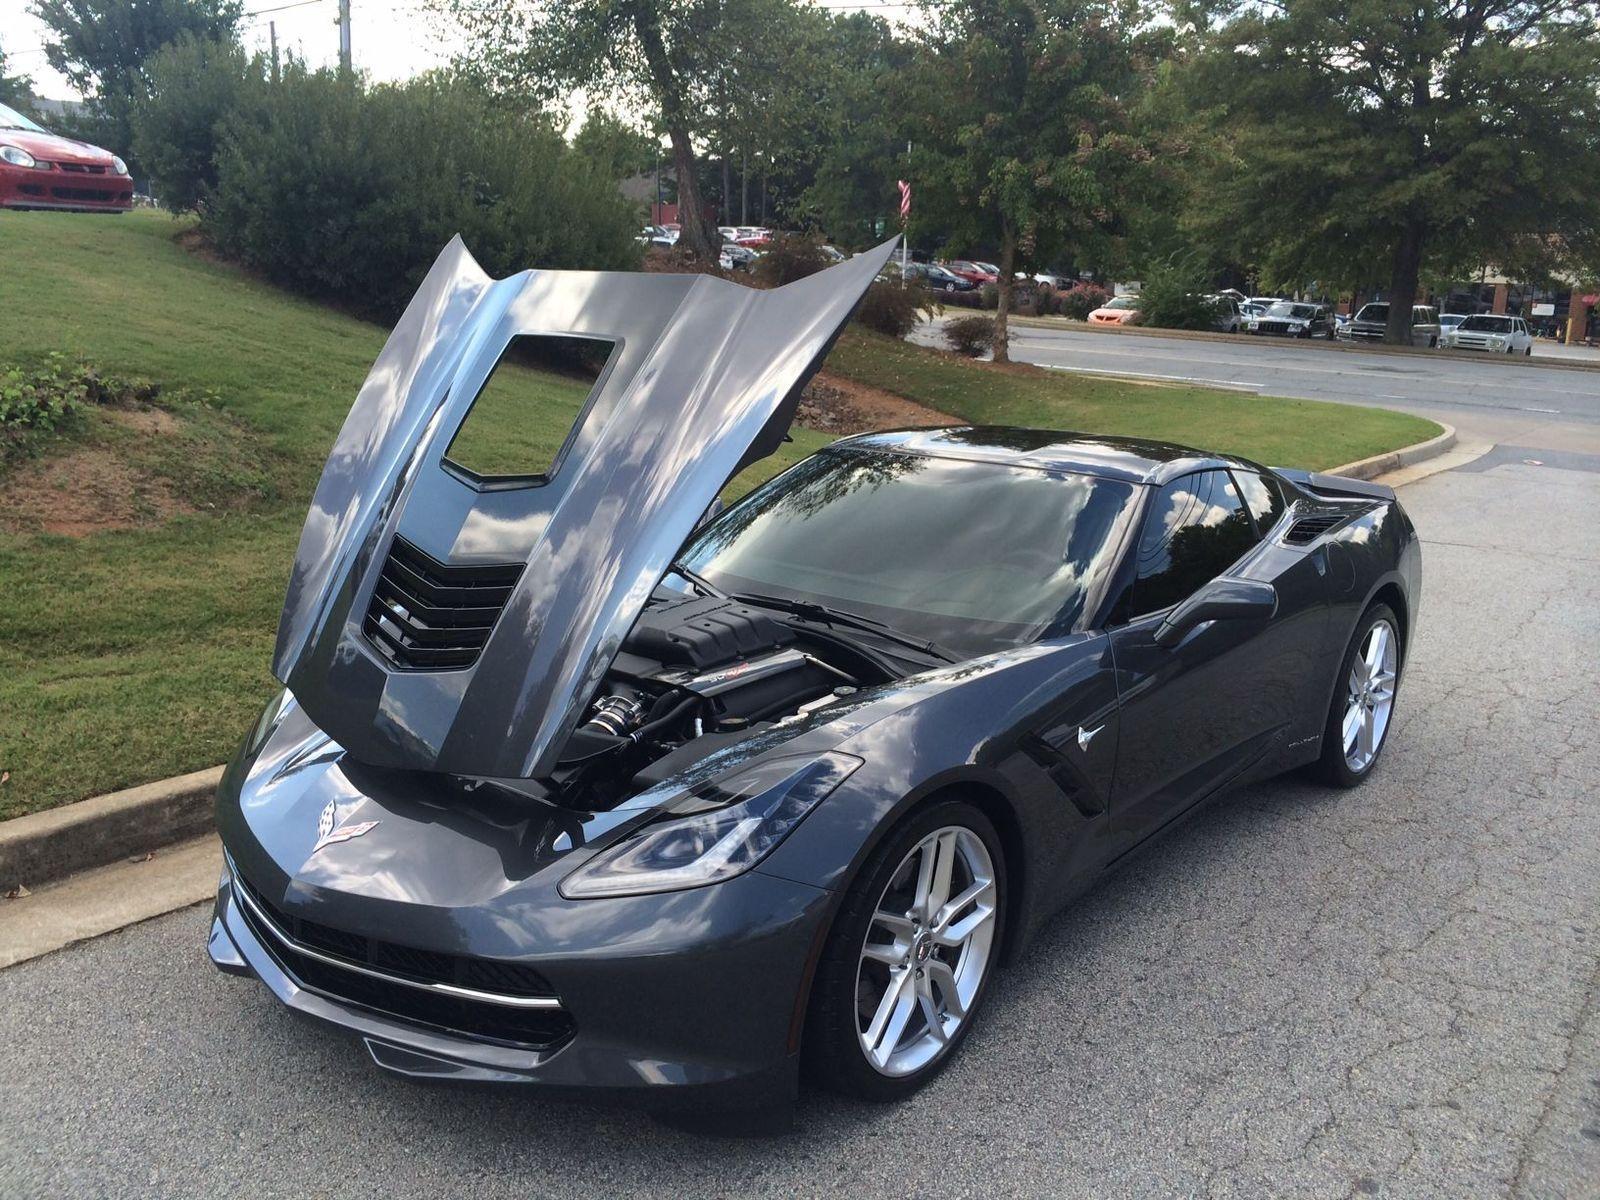 Chevrolet Corvette Stingray | Corvette Stingray with XPEL ULTIMATE installed